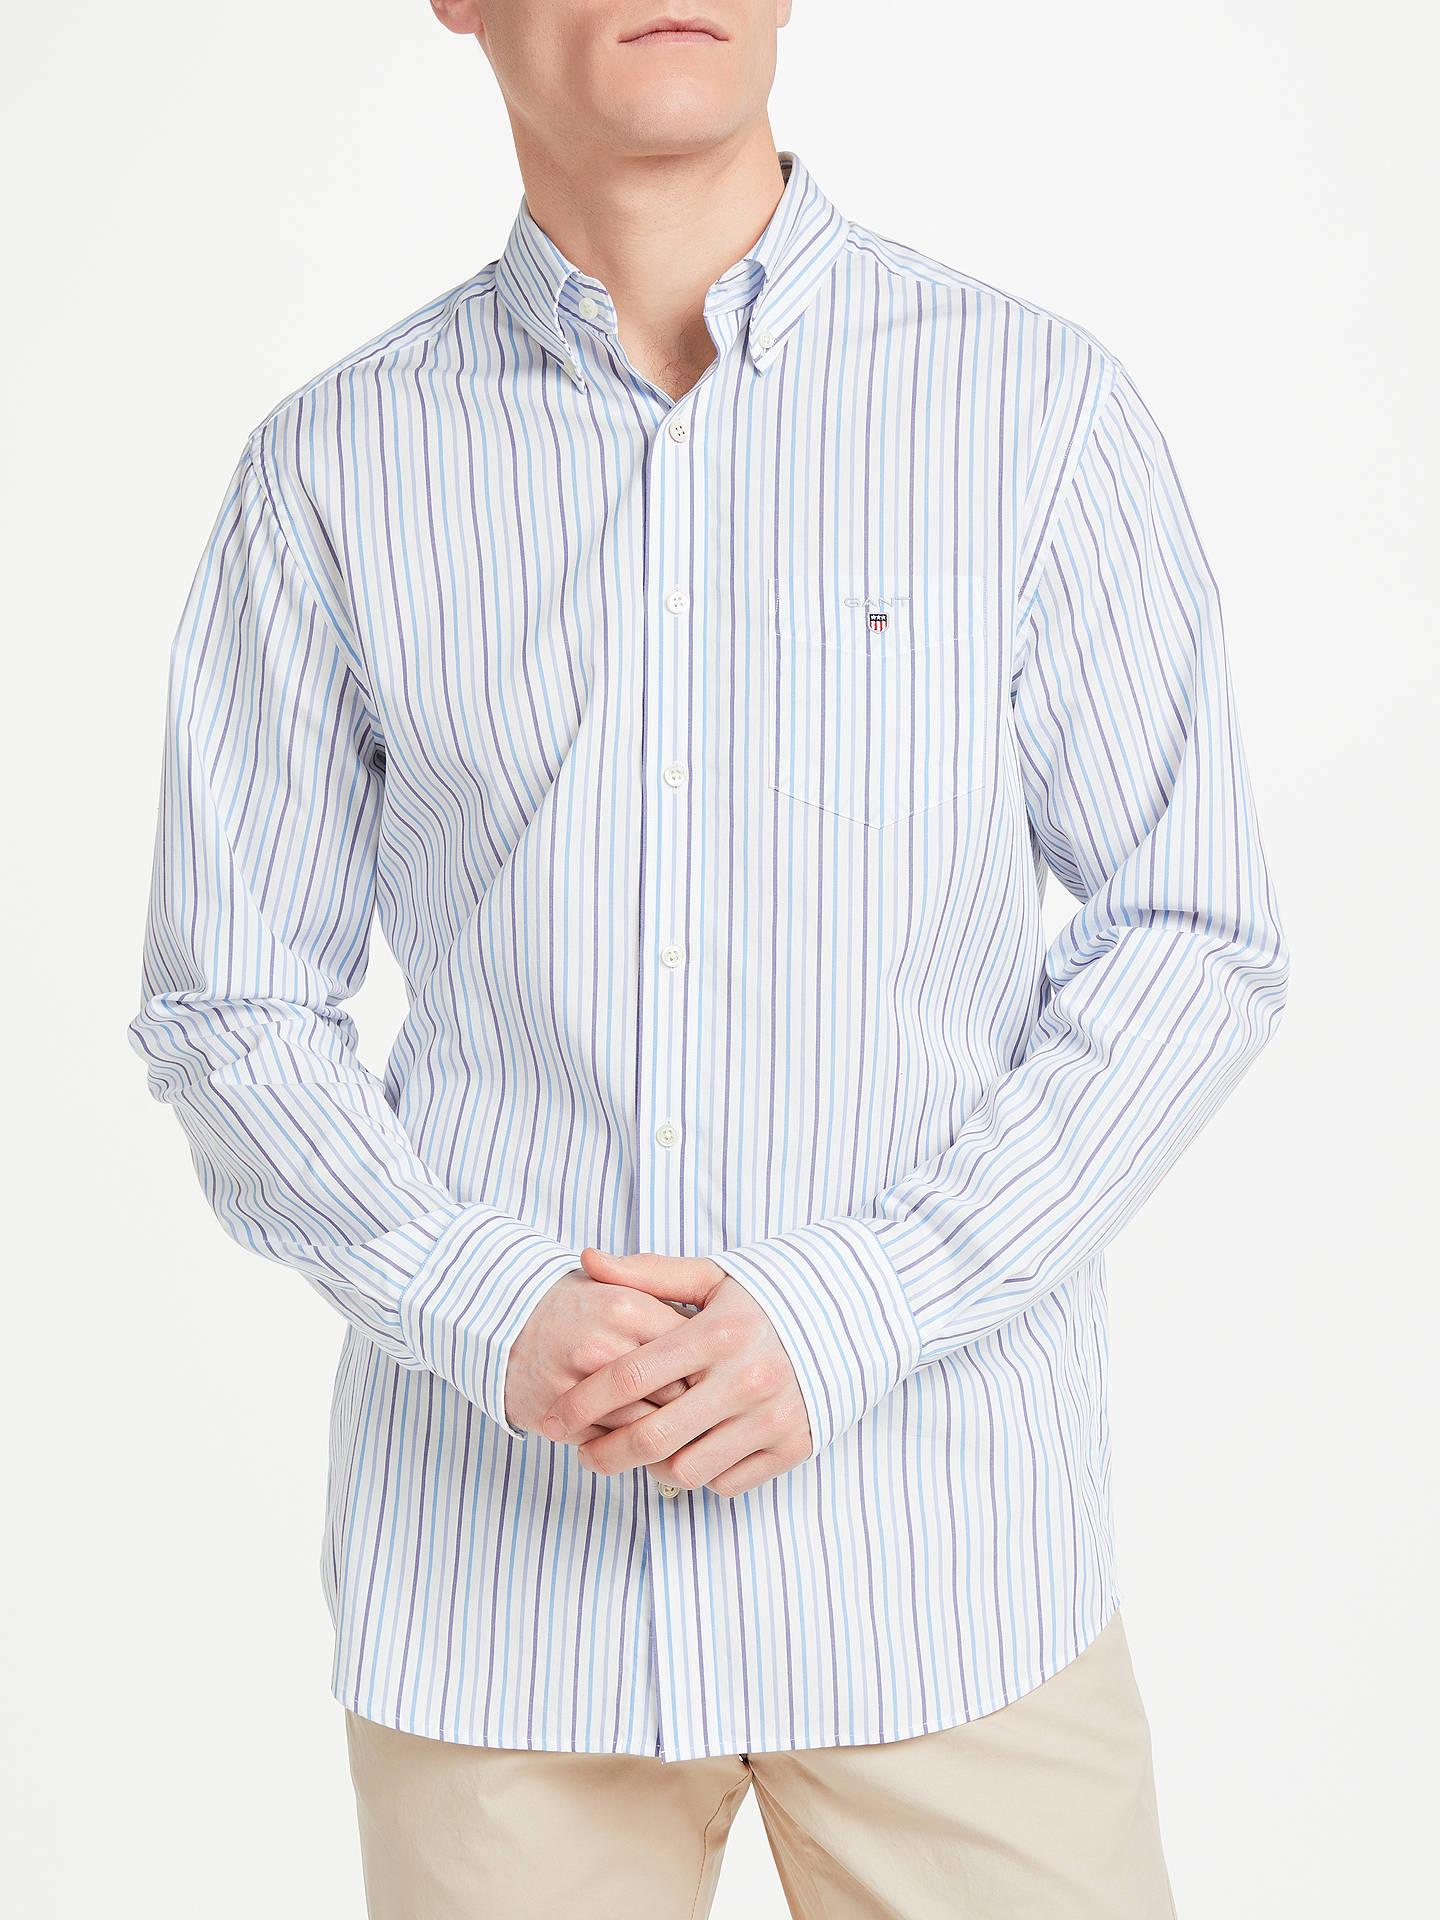 79ebc3510a Casual Shirts & Tops Gant Poplin Banker Stripe Shirt in Bright Red Pink  button down collar